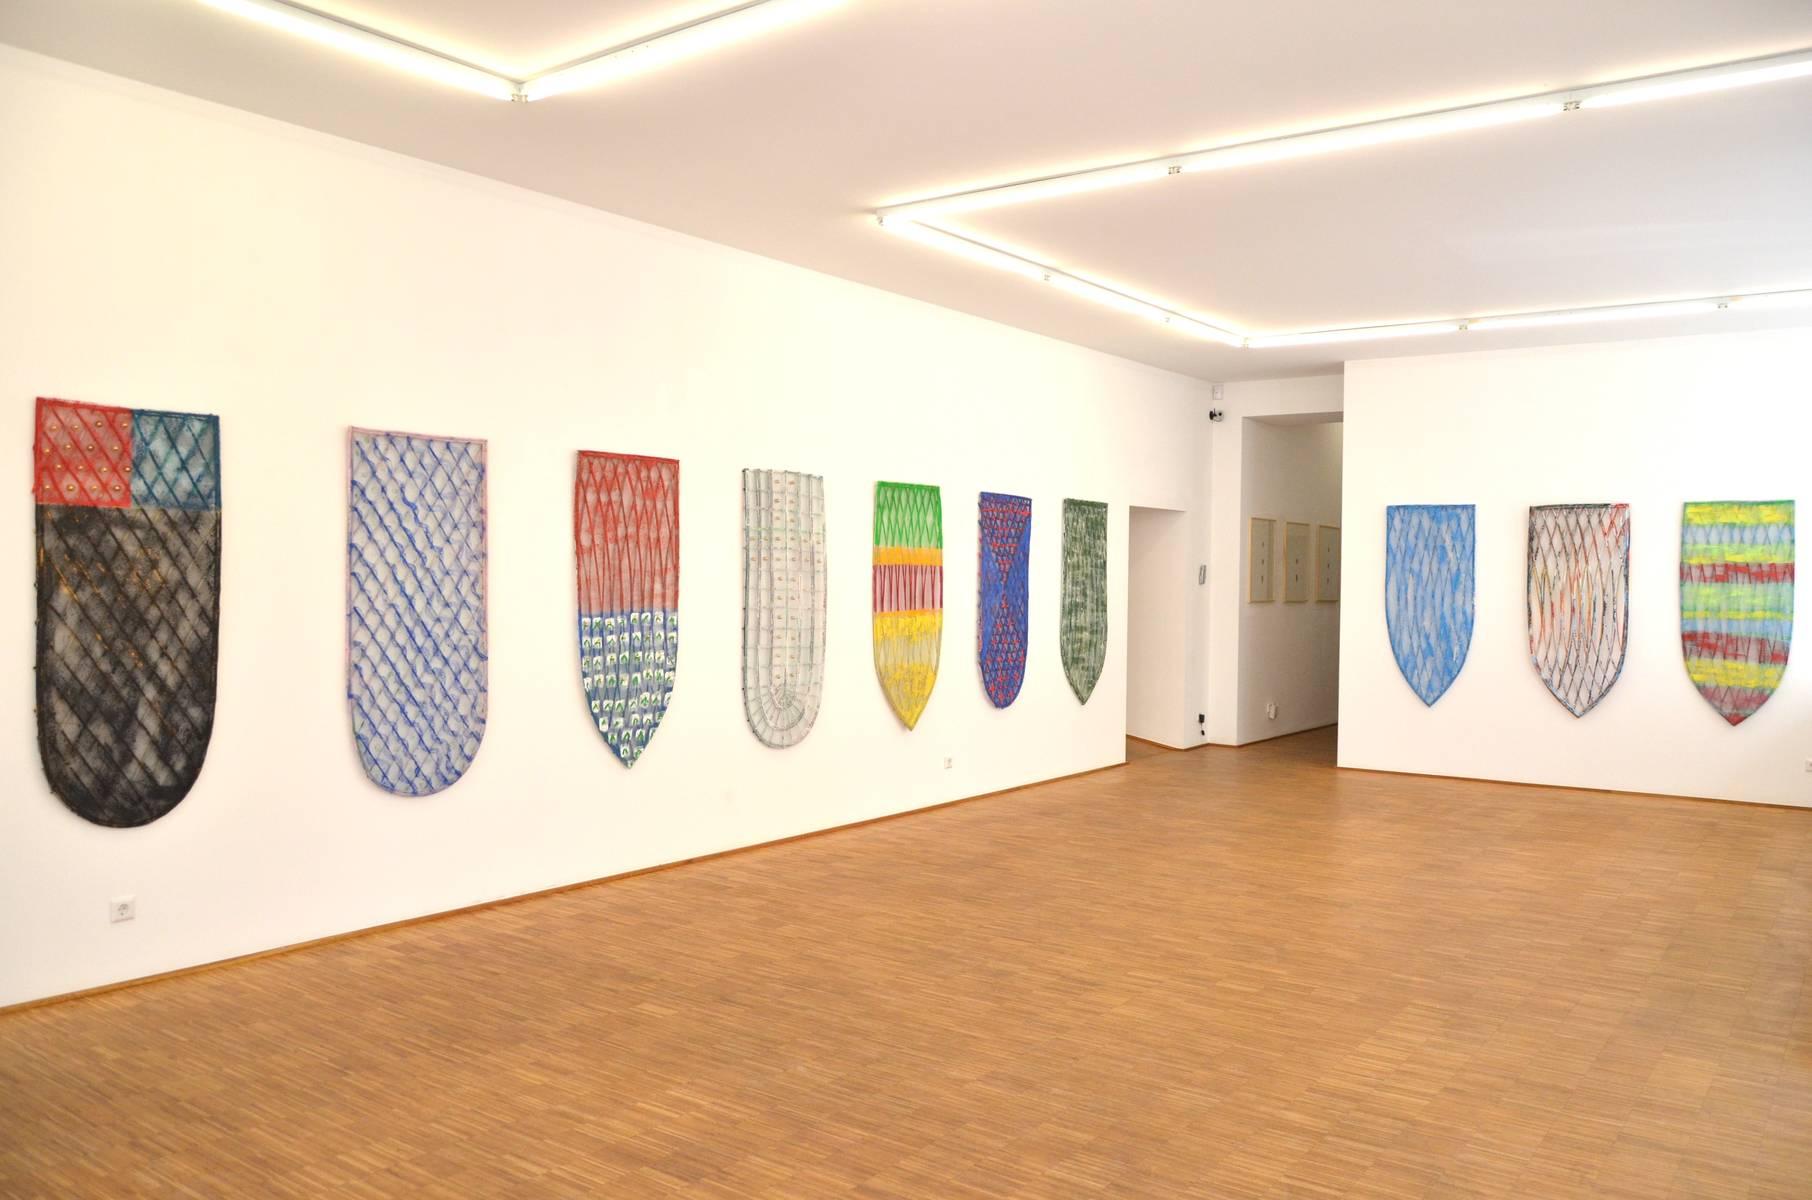 2_Daniel Dezeuze 2012 luxembourg 113